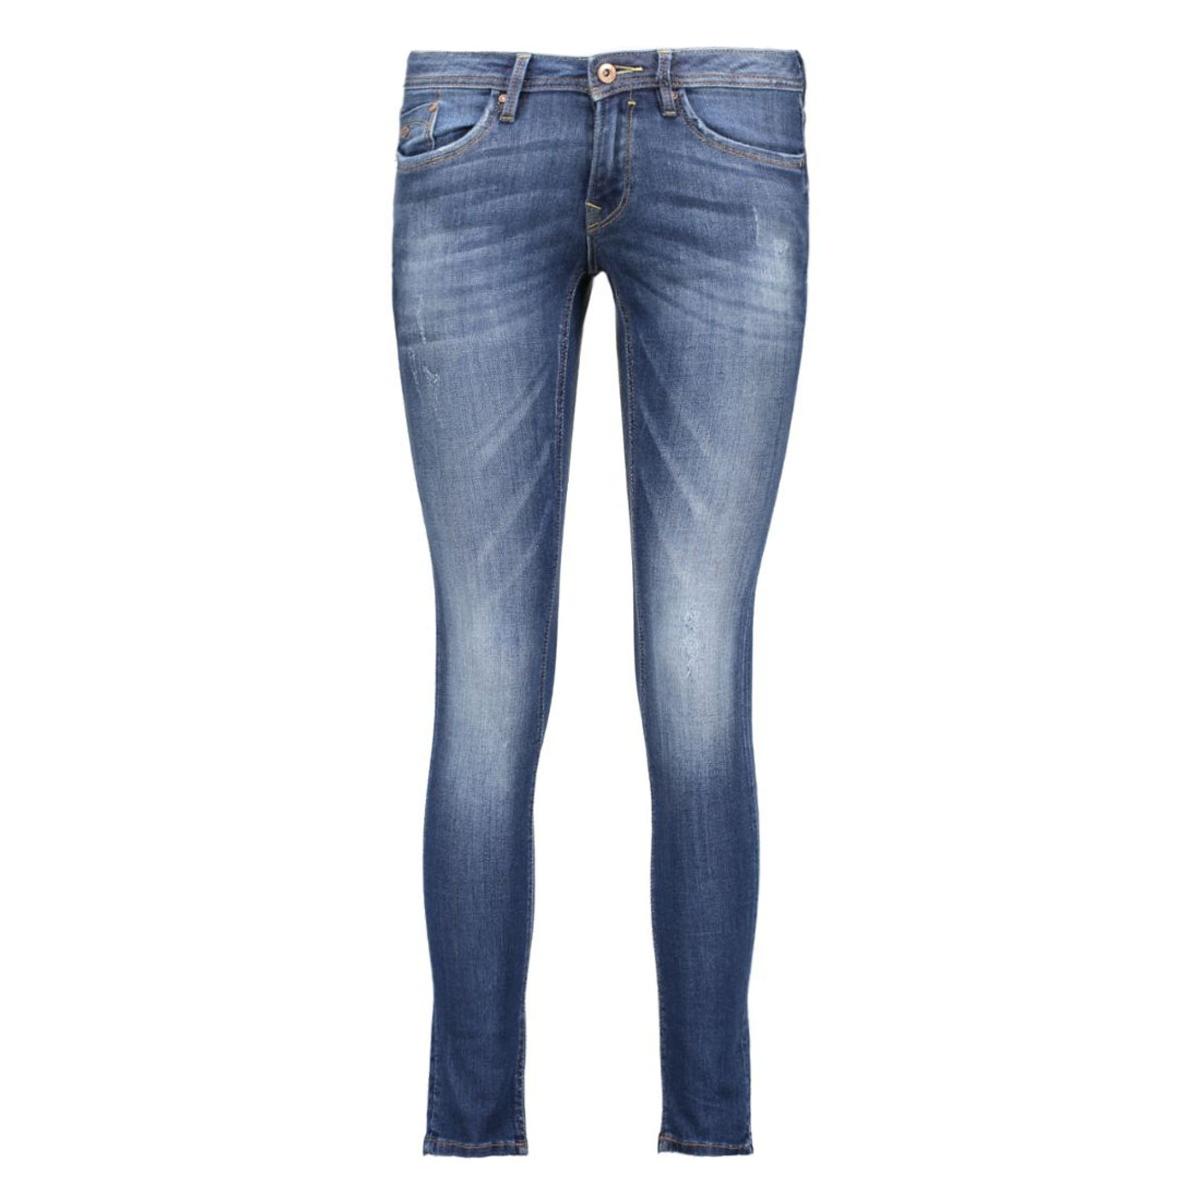 994cc1b922 edc jeans c939